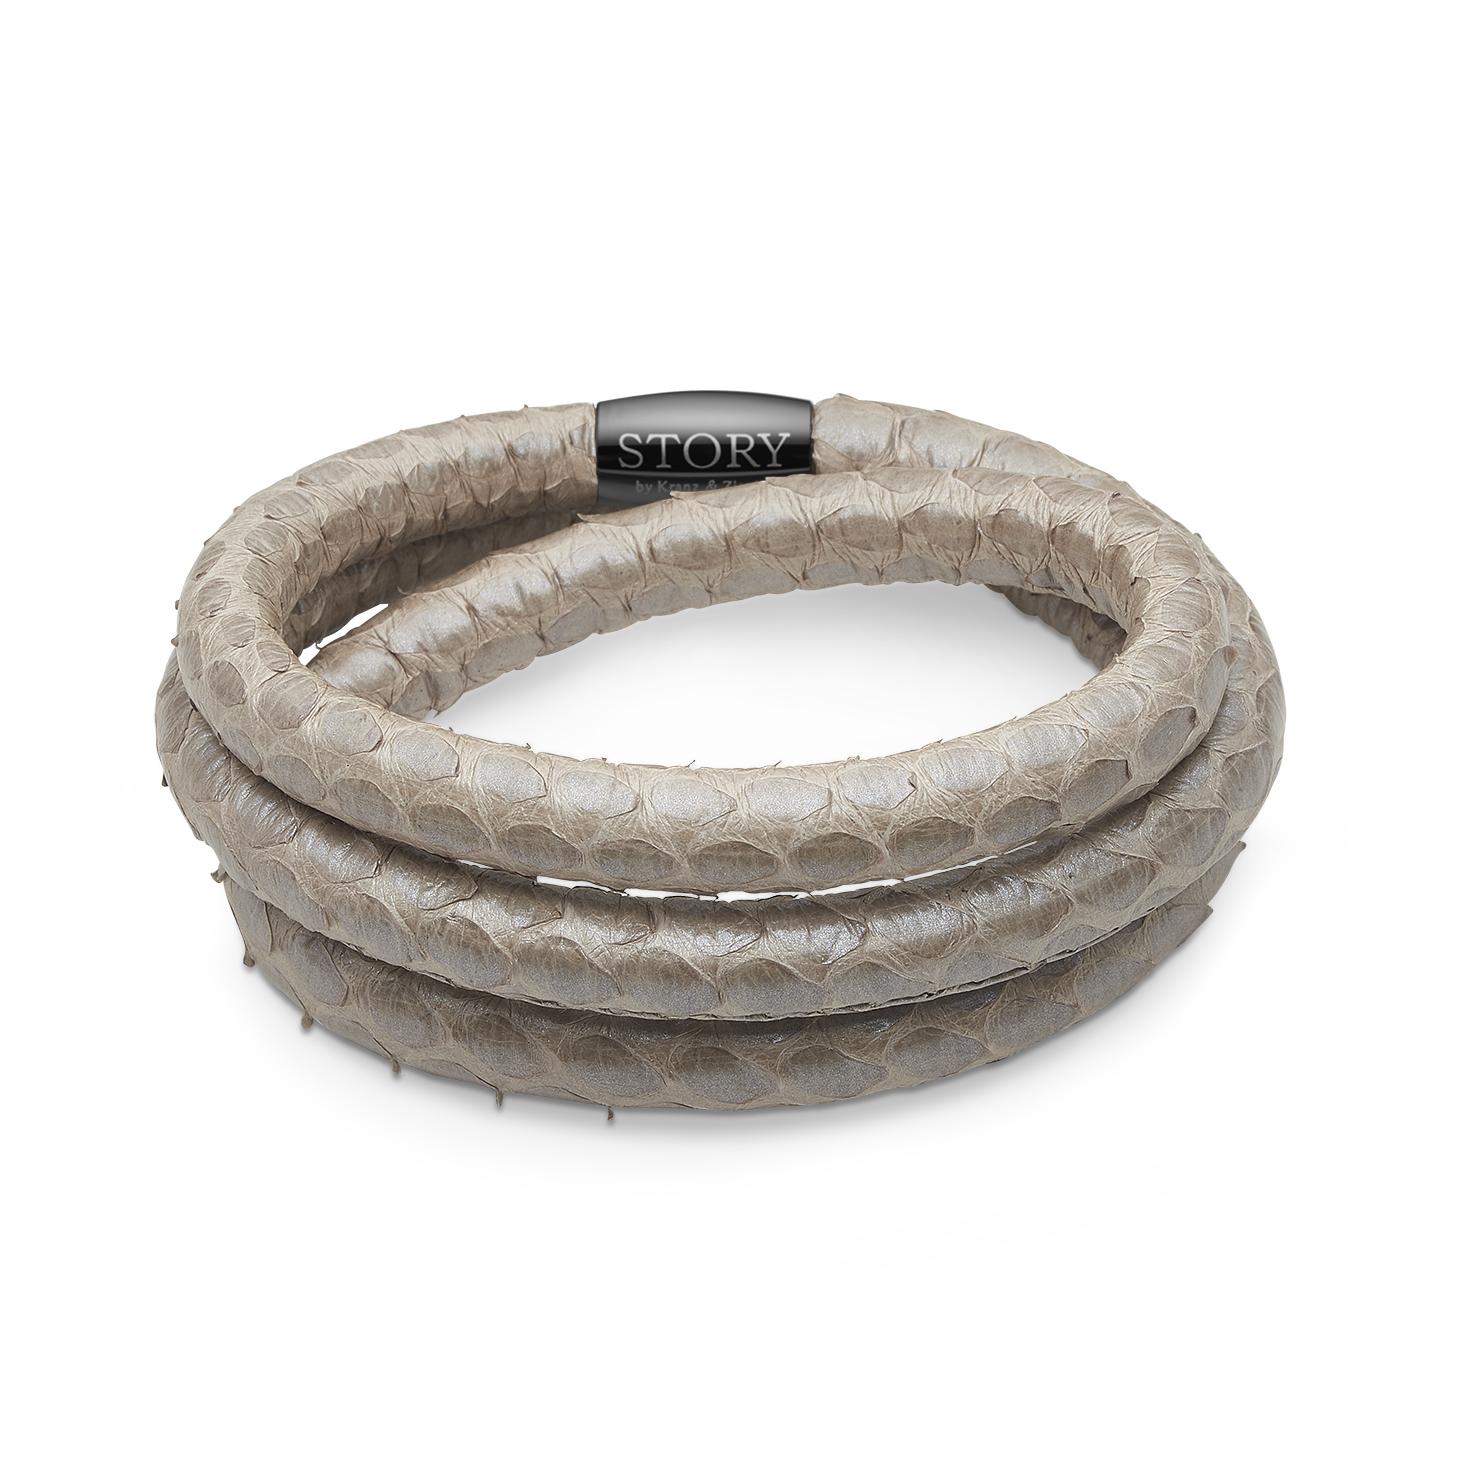 STORY Læderarmbånd grå perlemor slange - 1004871-3 57 centimeter